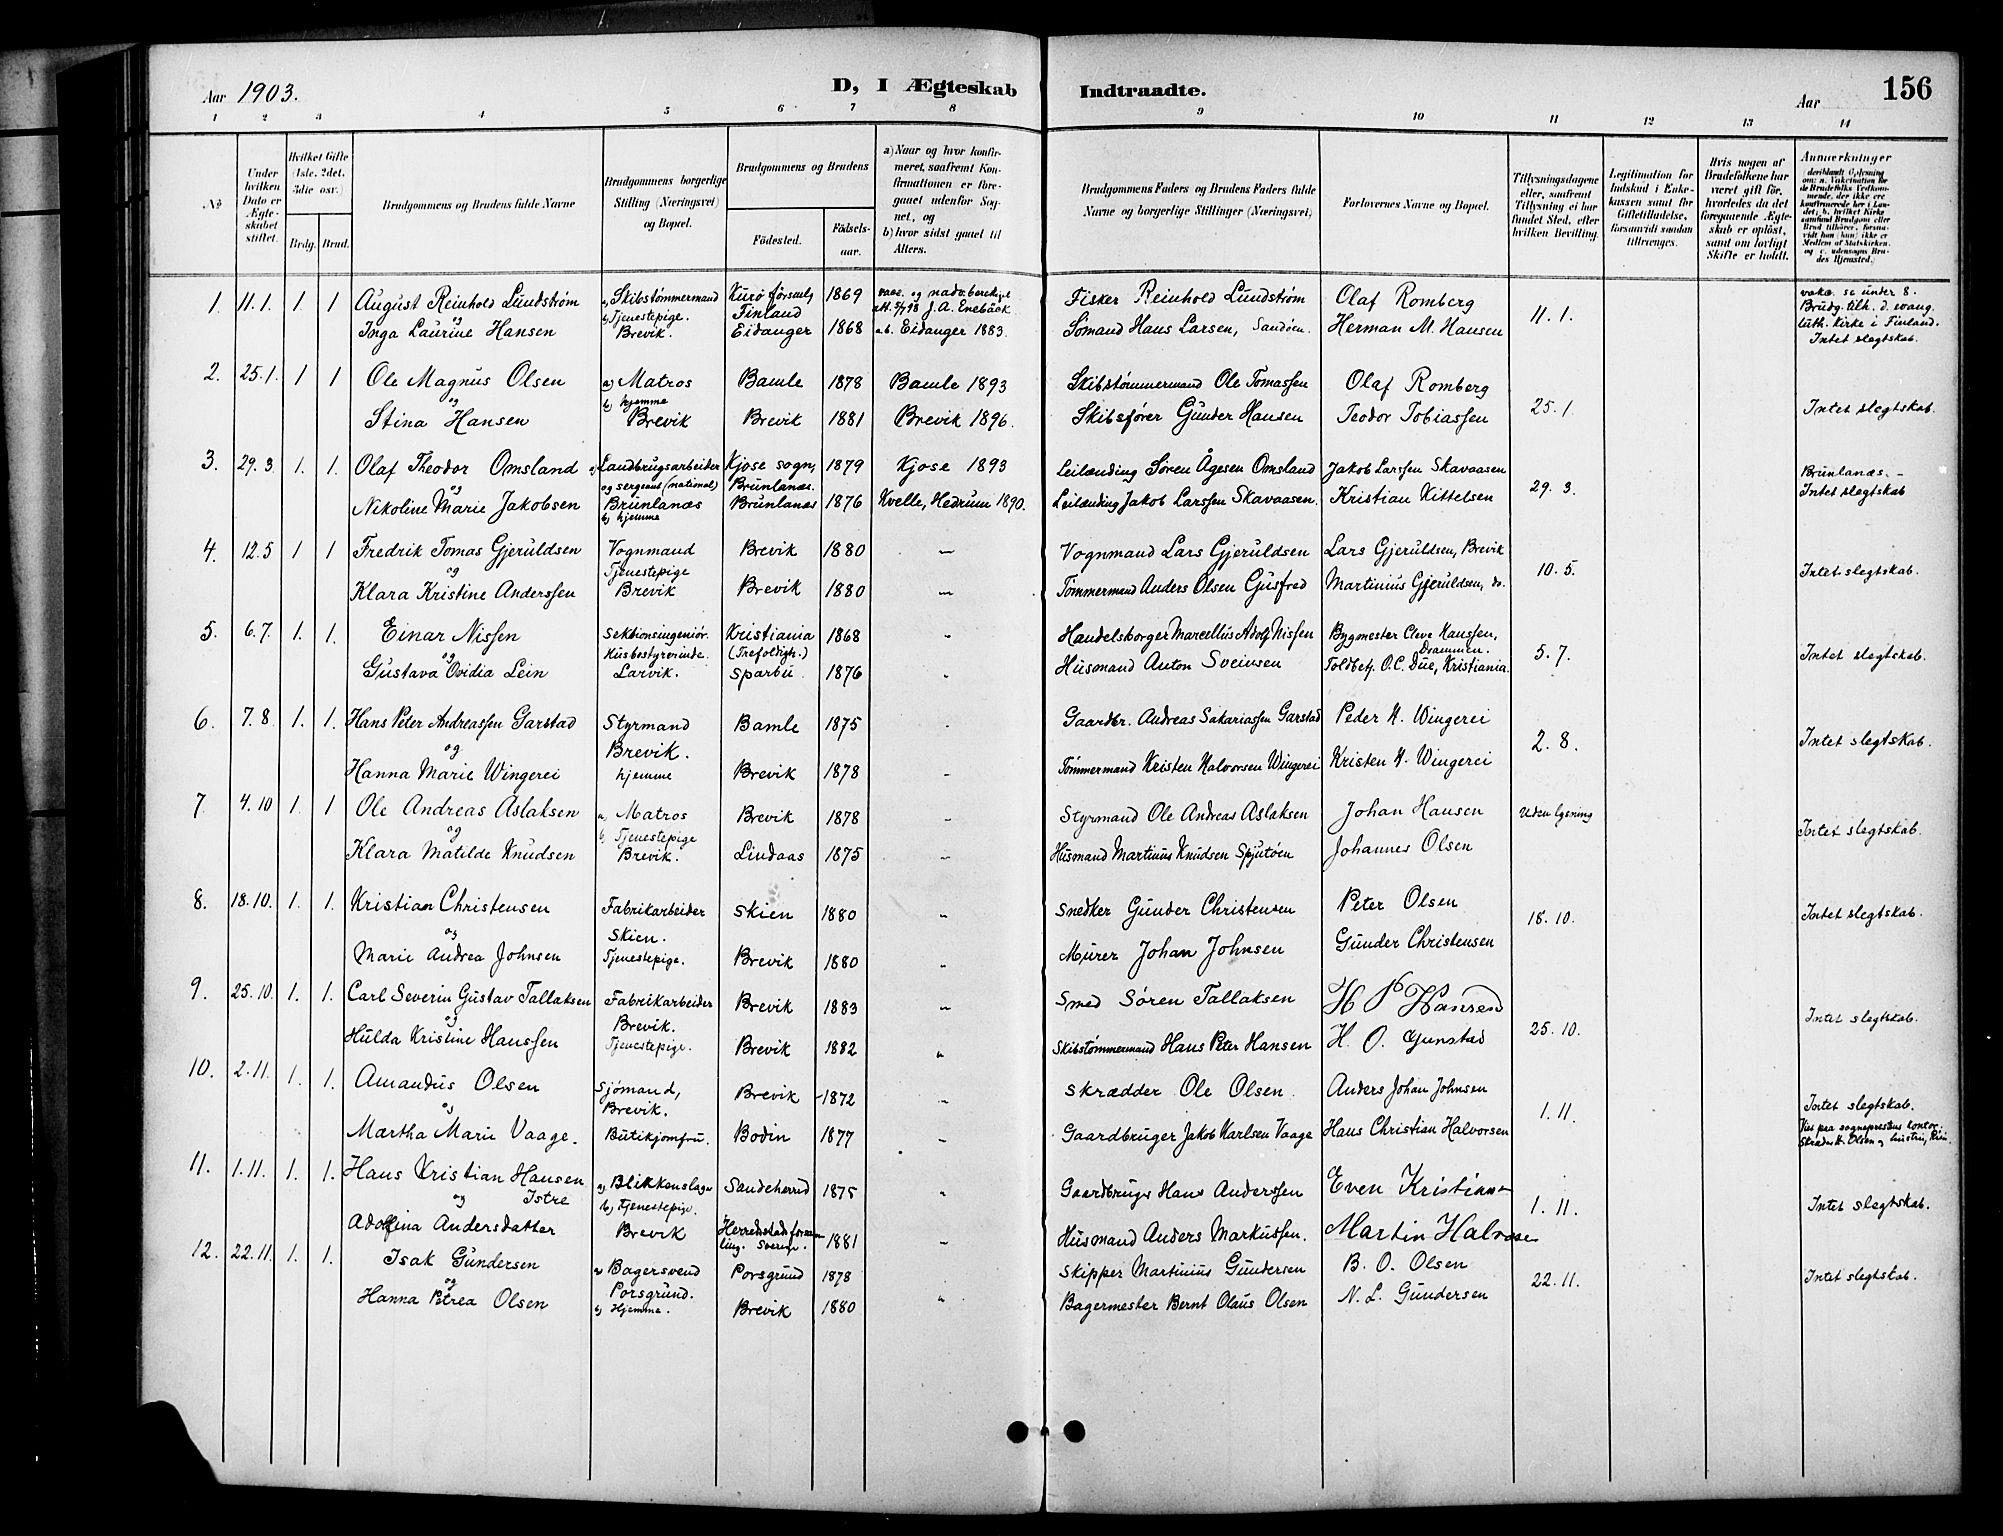 SAKO, Brevik kirkebøker, G/Ga/L0005: Klokkerbok nr. 5, 1901-1924, s. 156